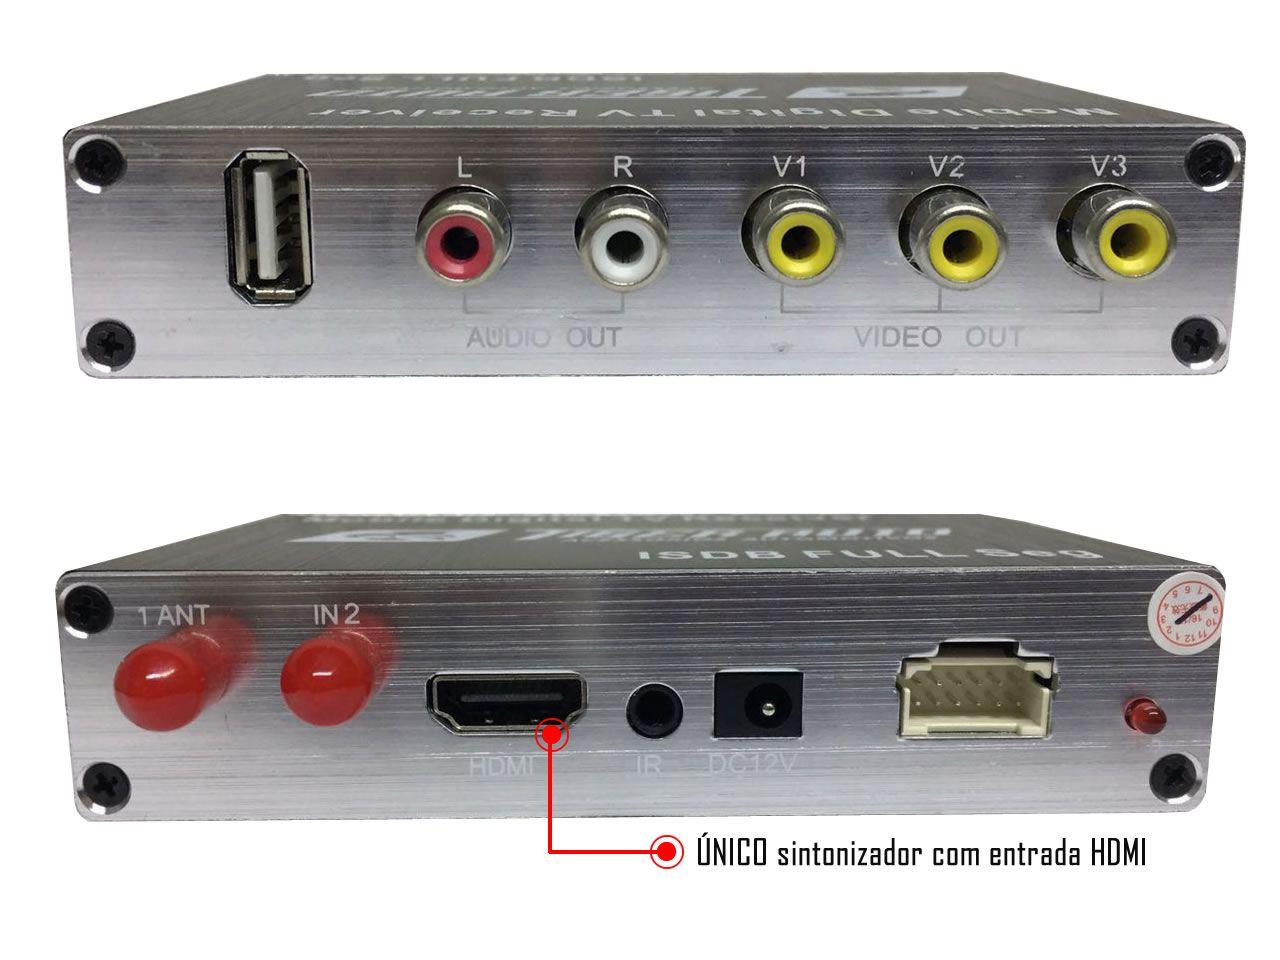 Sintonizador e Receptor Automotivo TV Digital Tiger Full HD Com Entrada HDMI- Universal